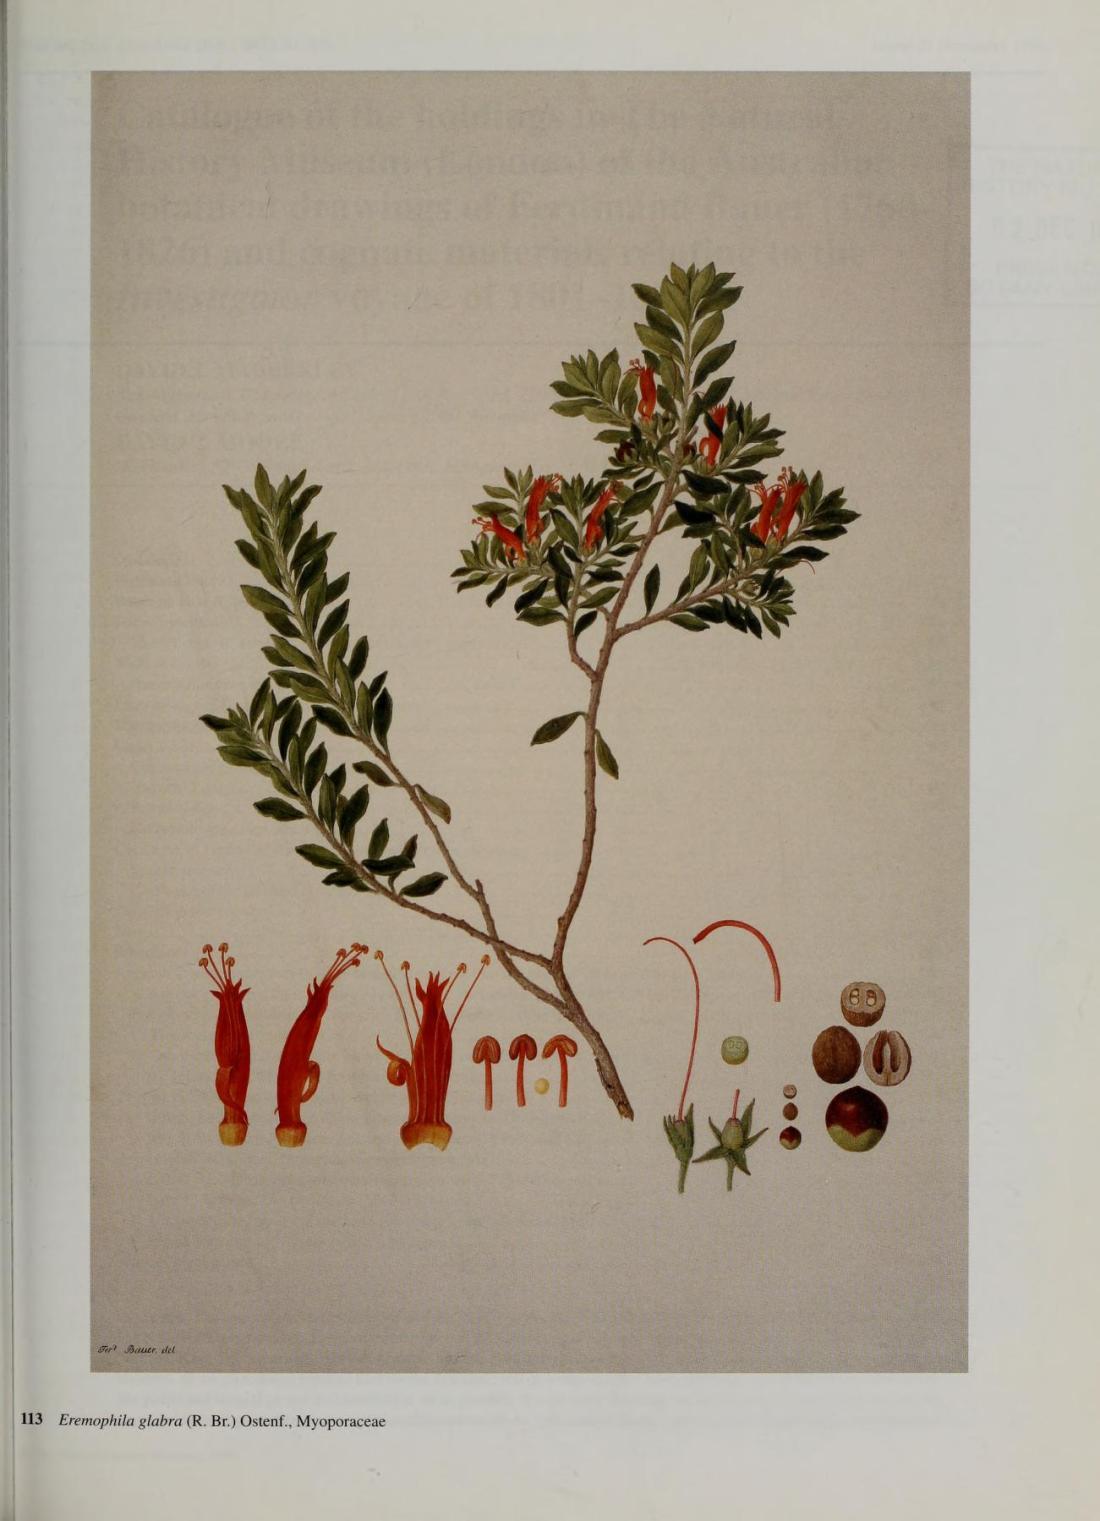 """Eremophila glabra (R.Br), Ostenf, Myoporaceae."" #113."